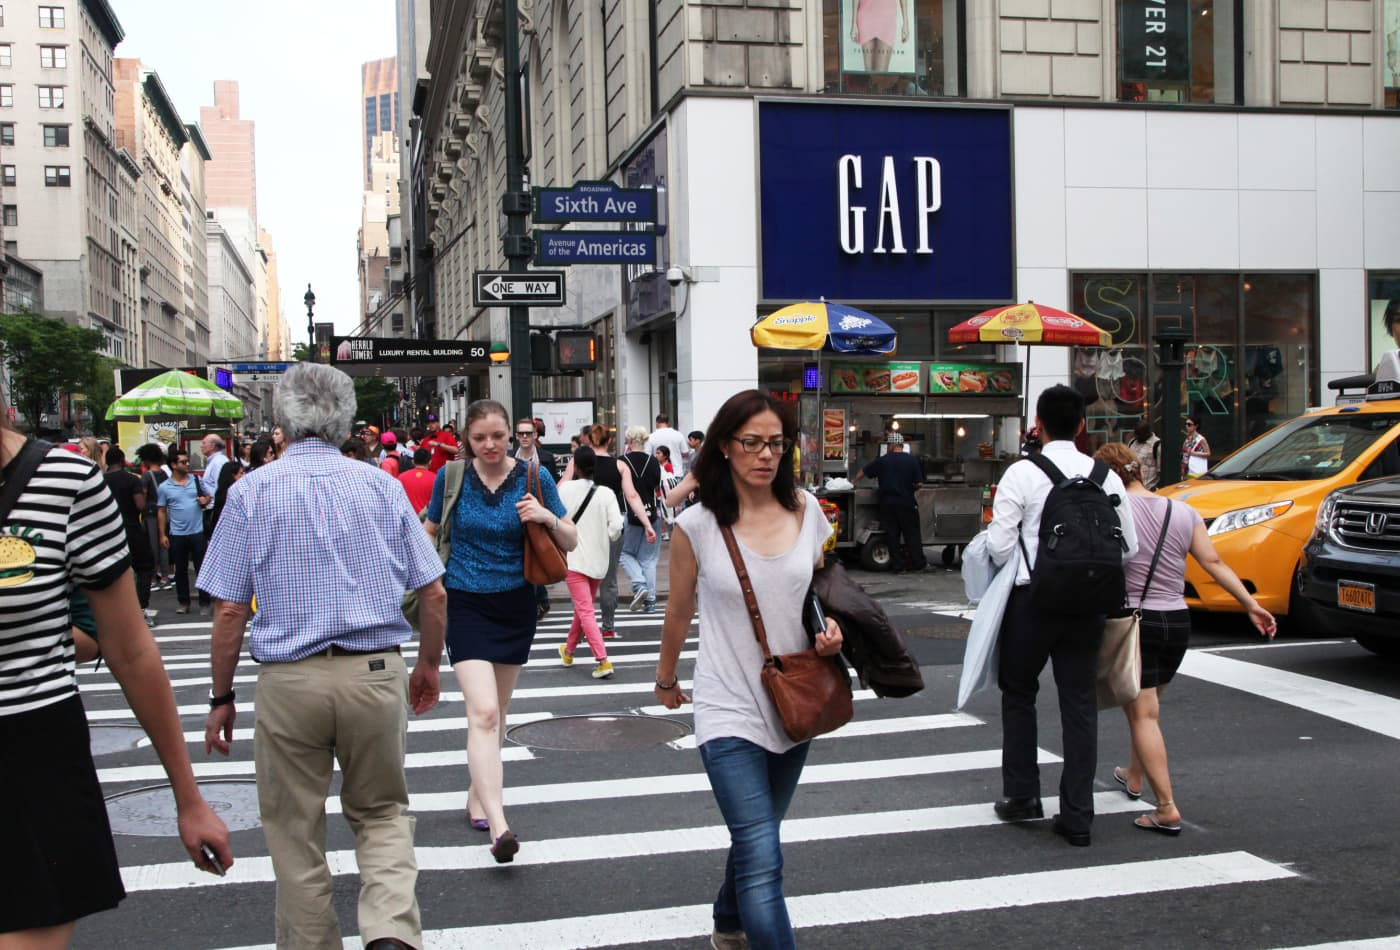 Gap is no longer spinning off Old Navy, sending shares higher